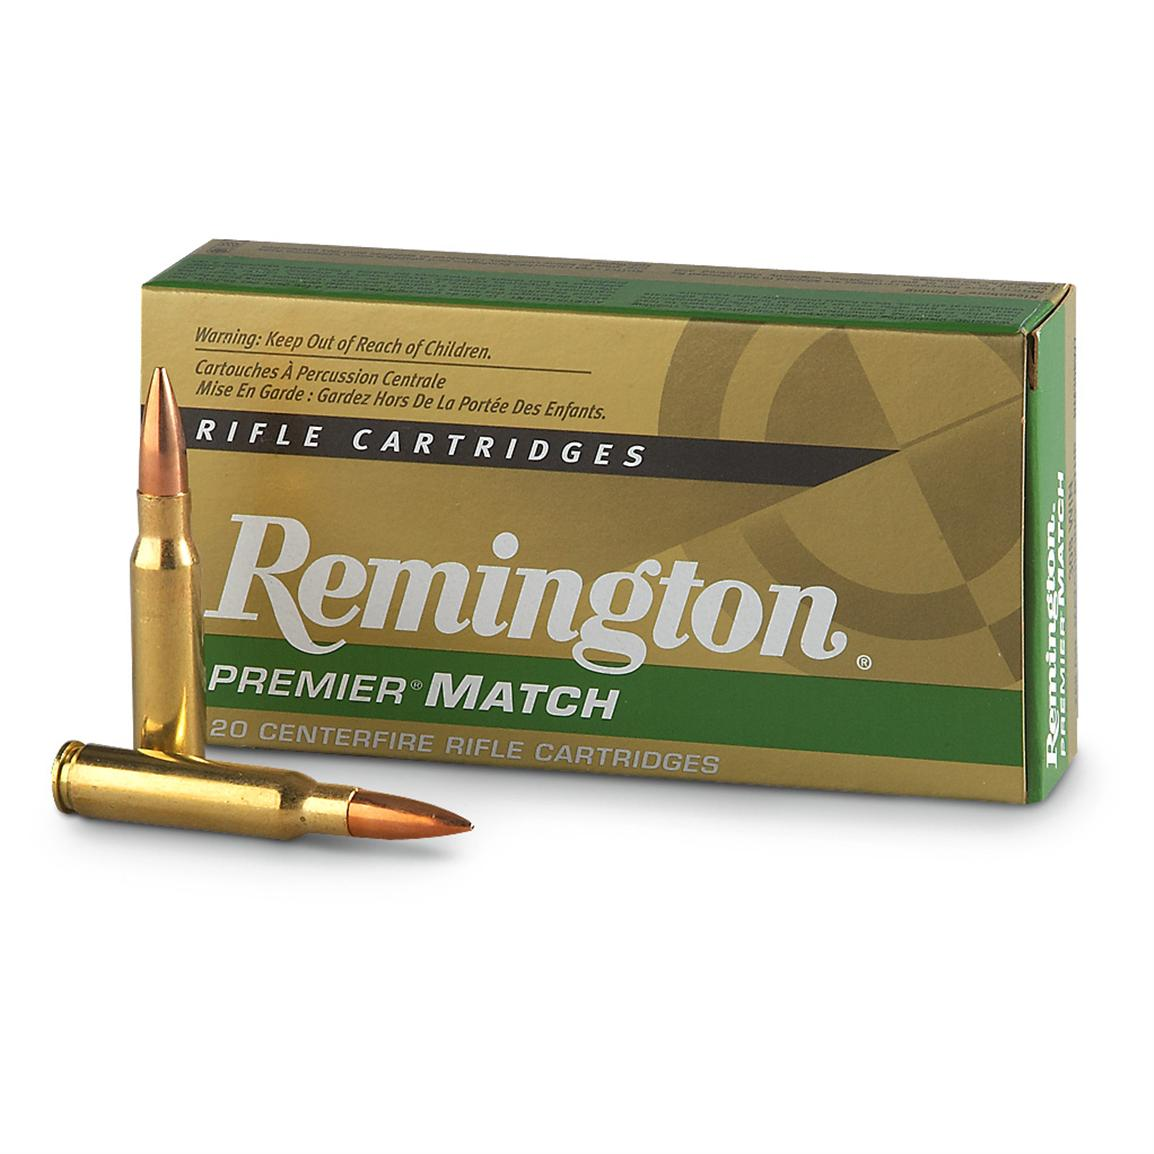 Remington Premier Match 308 Winchester Ammo 168 Grain Sierra MatchKing Boat Tail Hollow Point